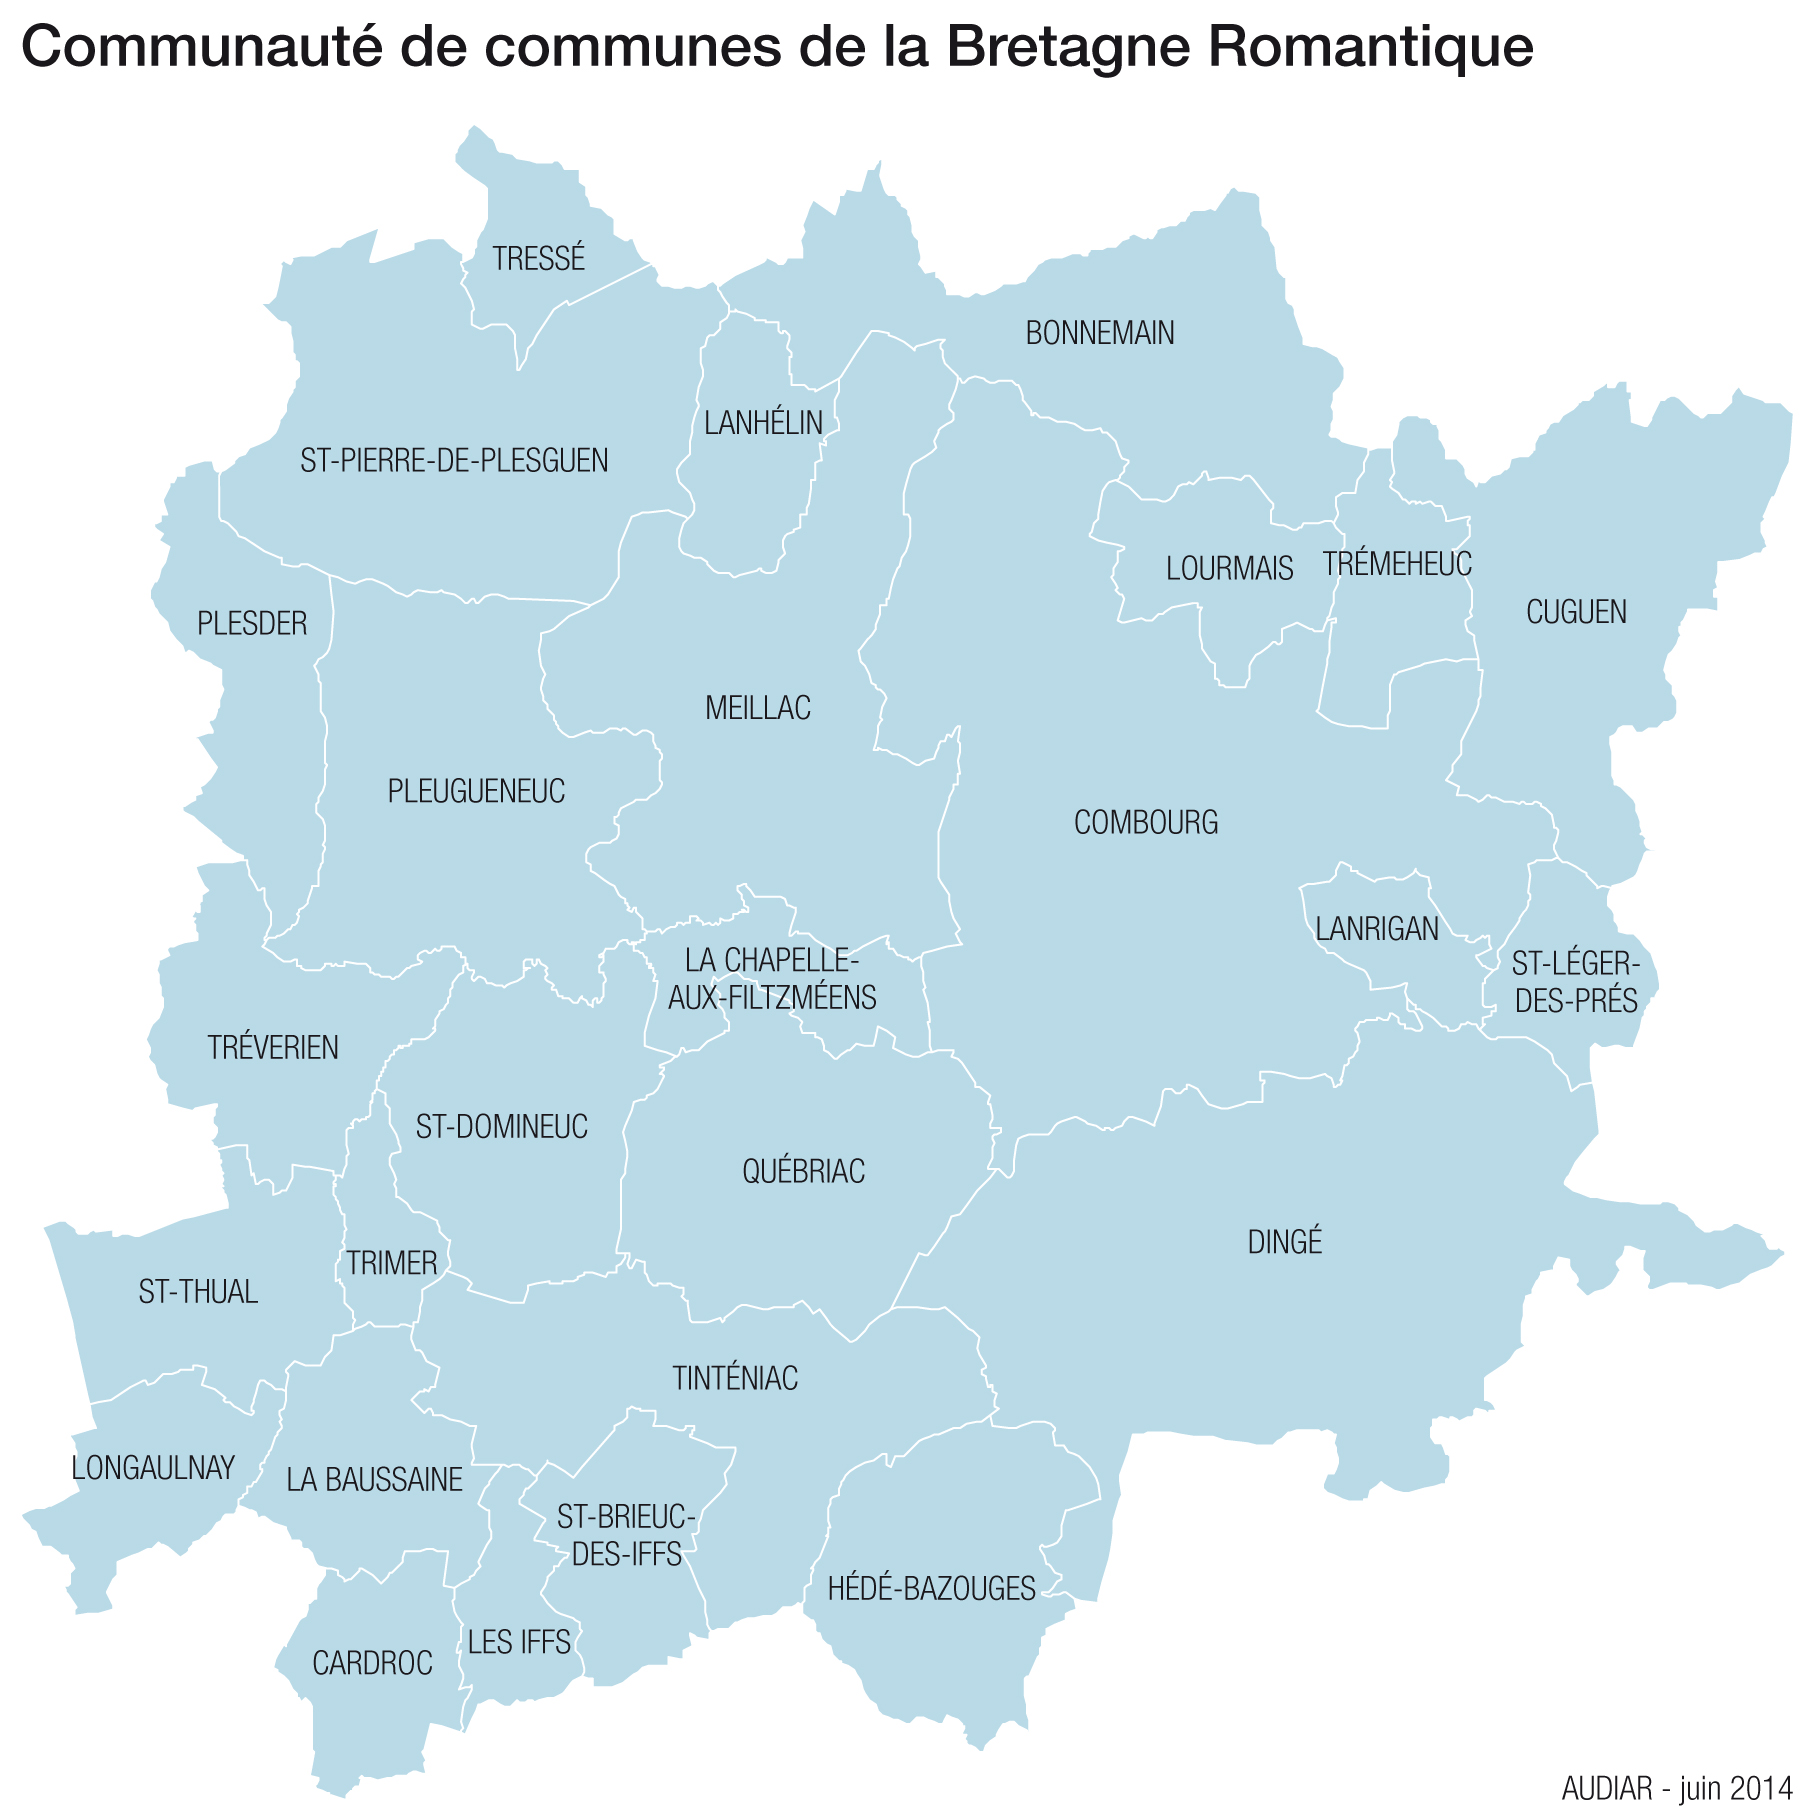 Carte Bretagne Romantique.Le Territoire D Intervention Audiar